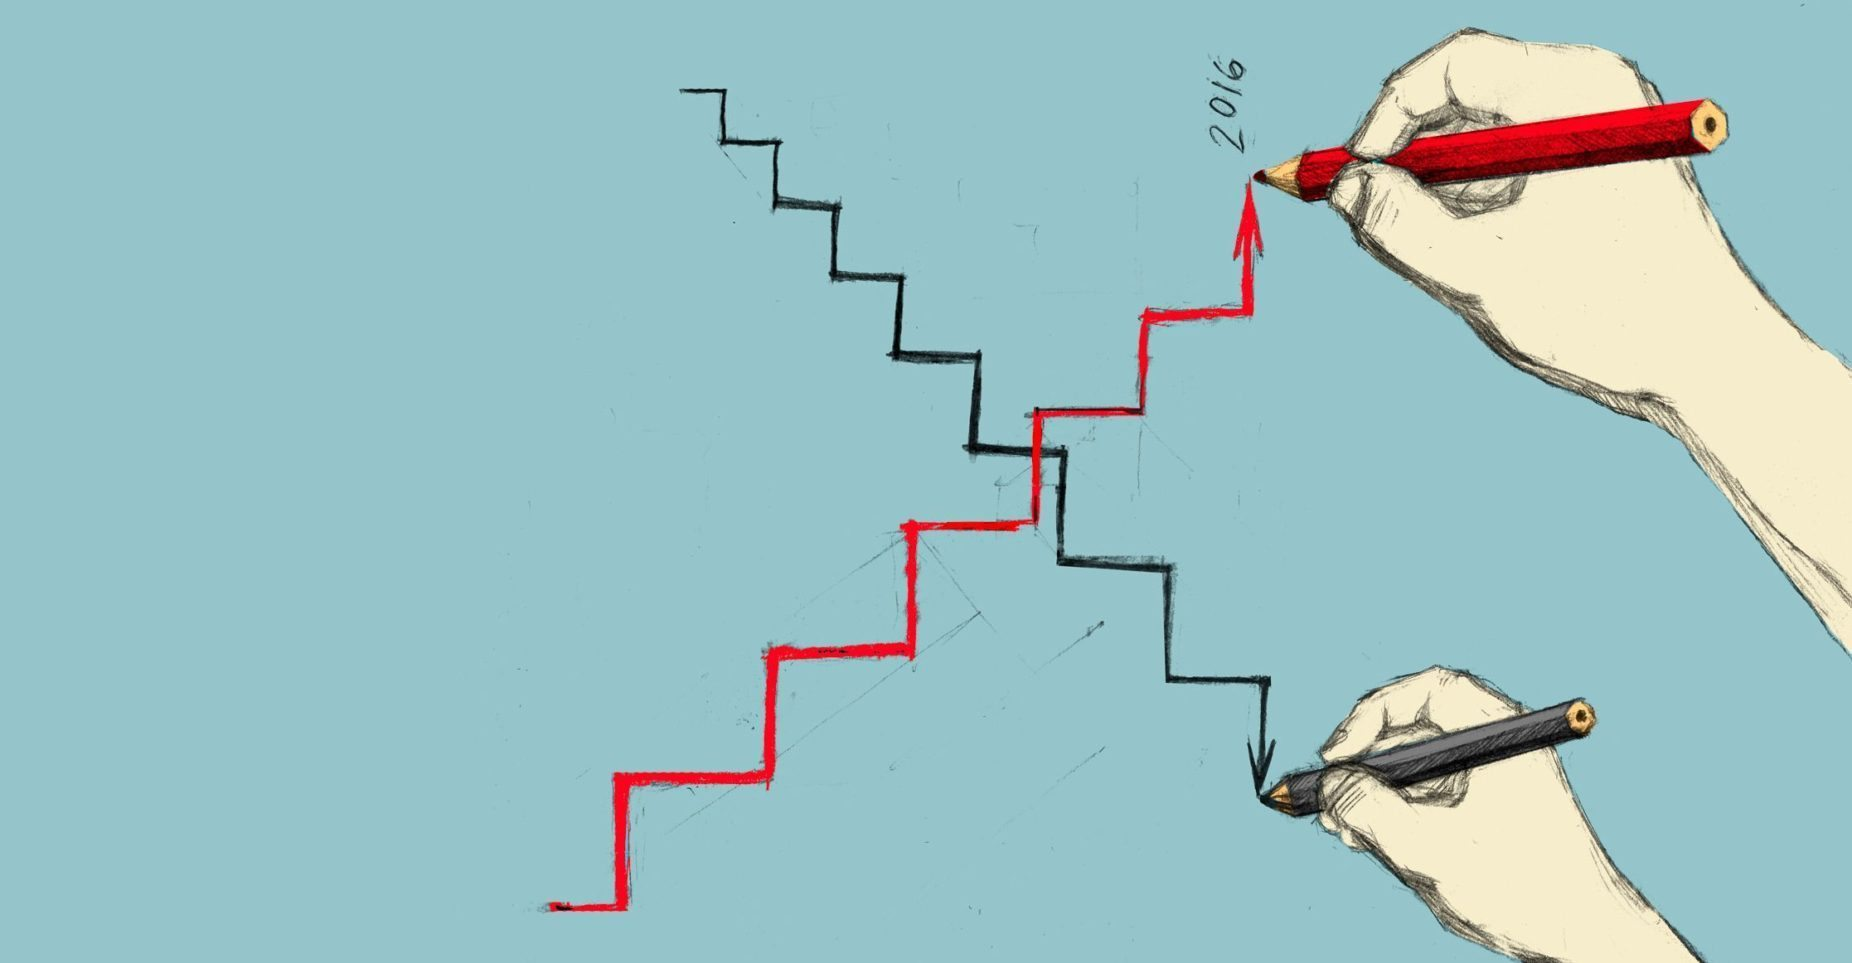 Image: hand drawing step going upward